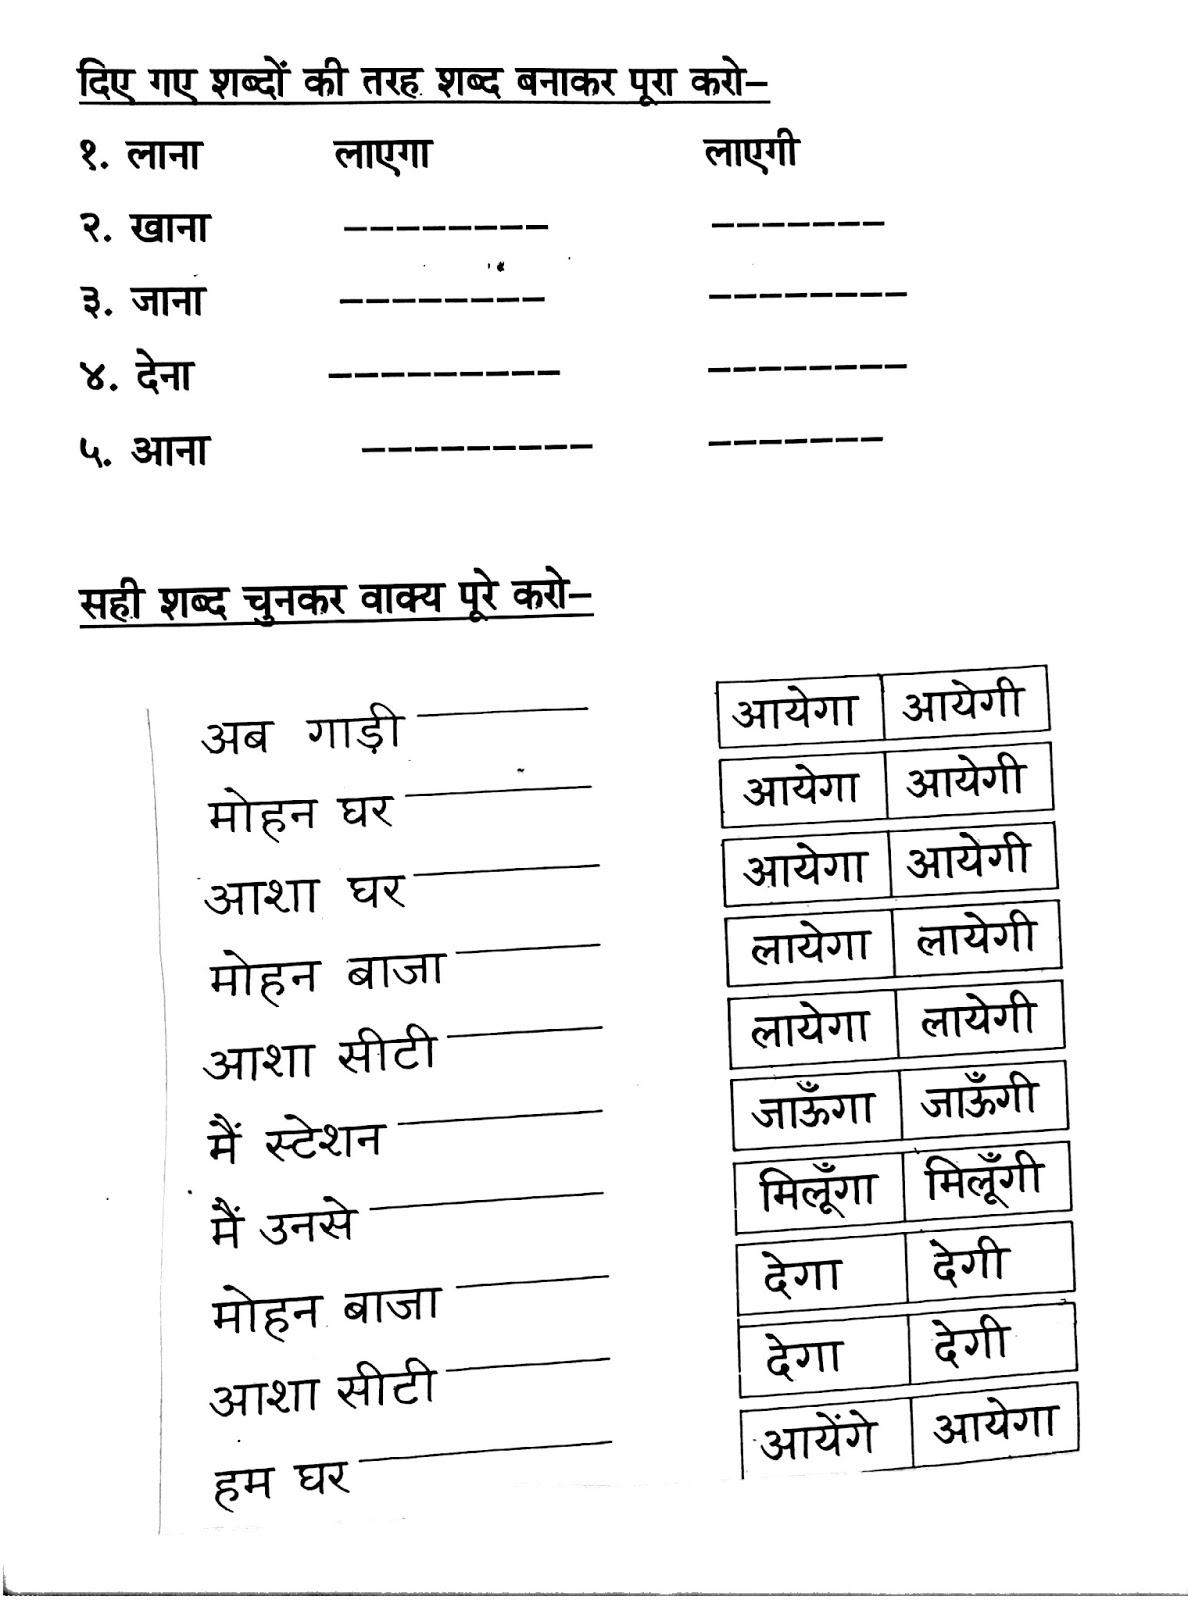 Hindi Kaal Worksheet   Printable Worksheets and Activities for Teachers [ 1600 x 1188 Pixel ]